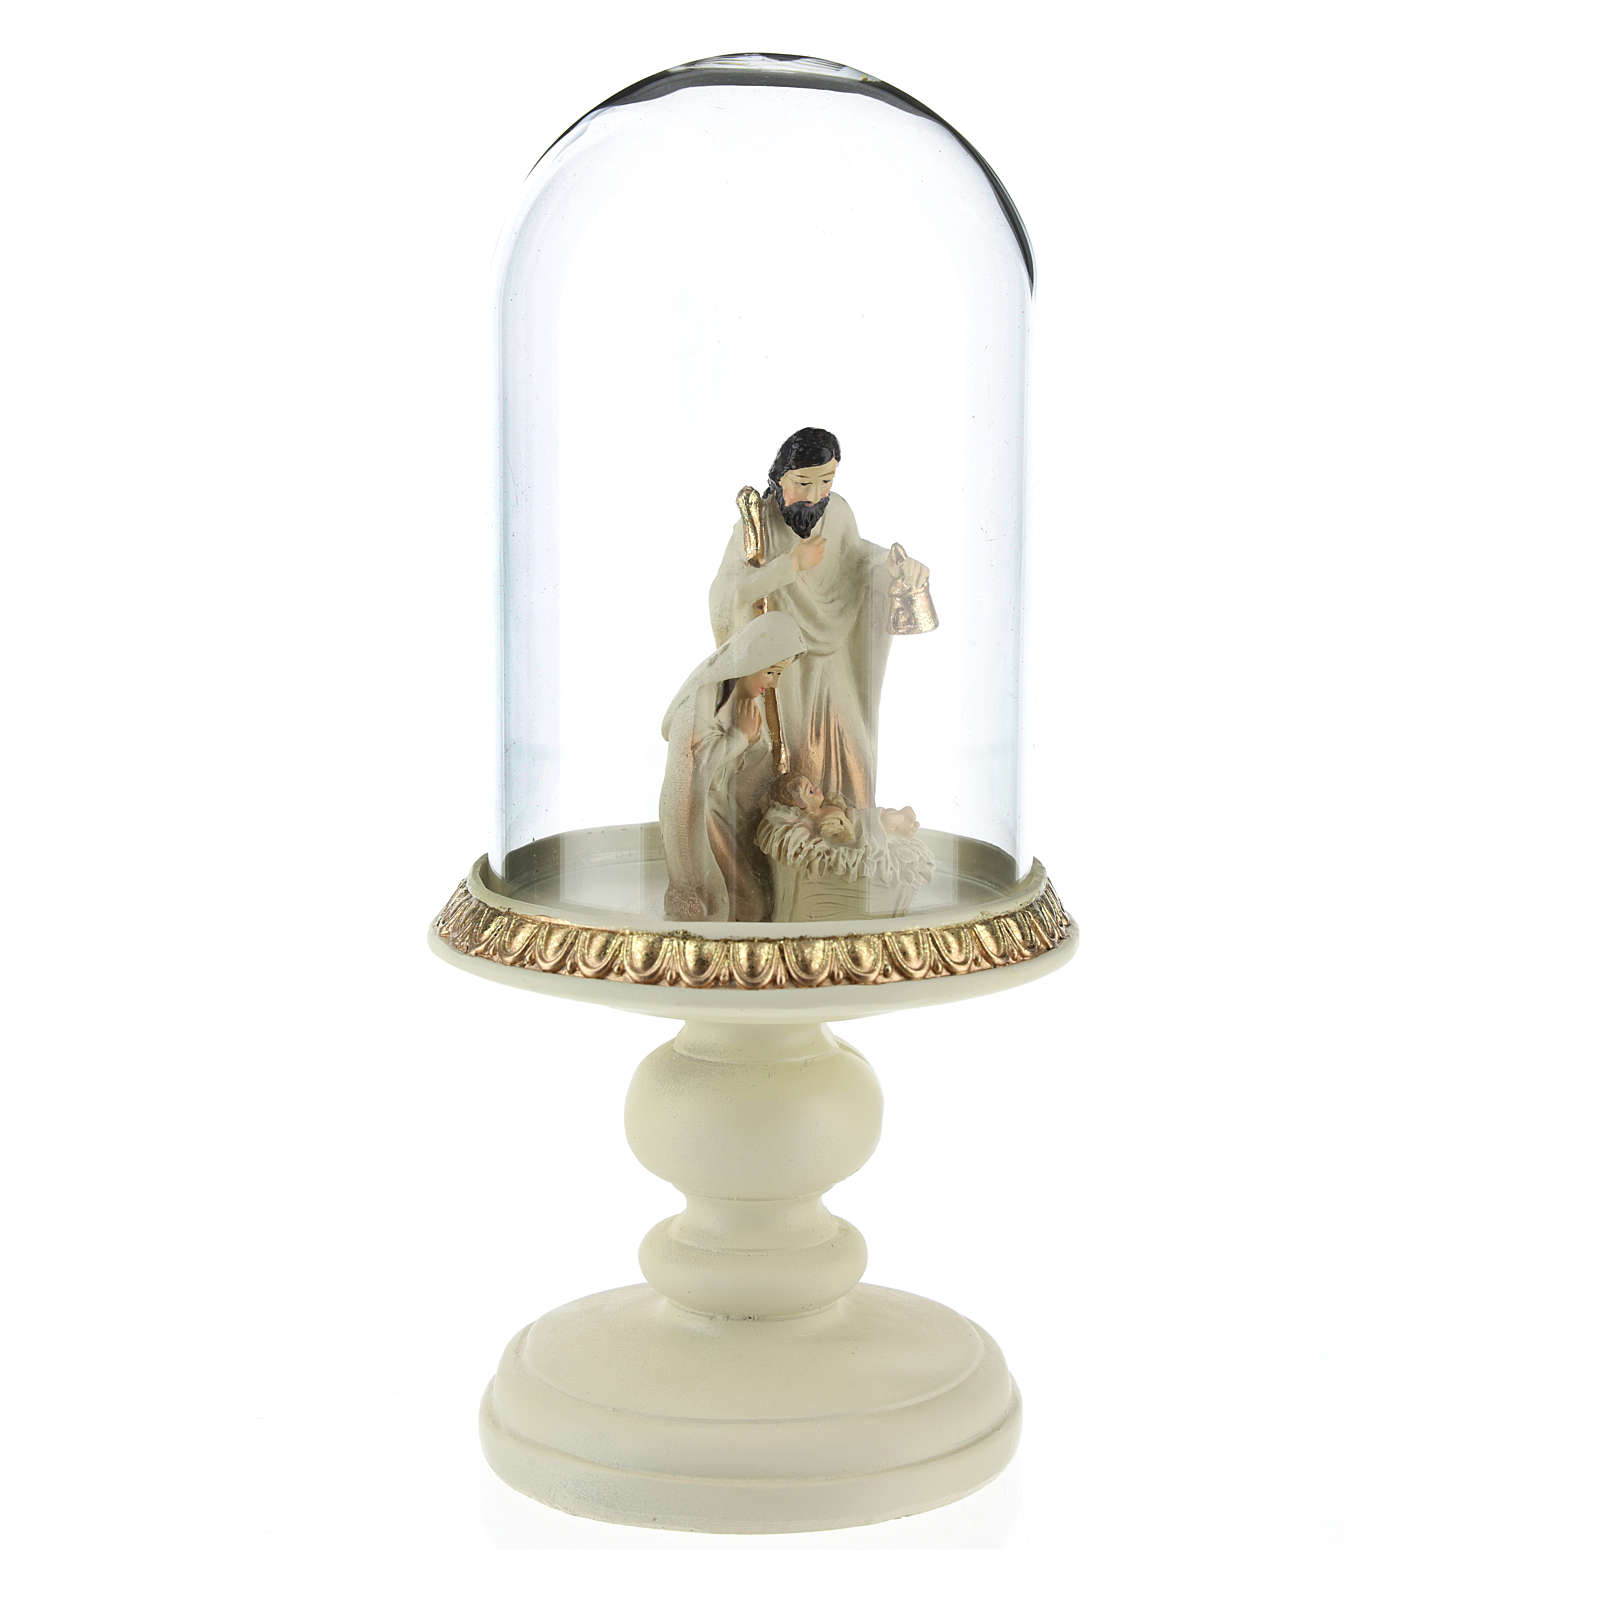 Natividad de resina 8 cm Brown con cúpula de vidrio 21 cm 3